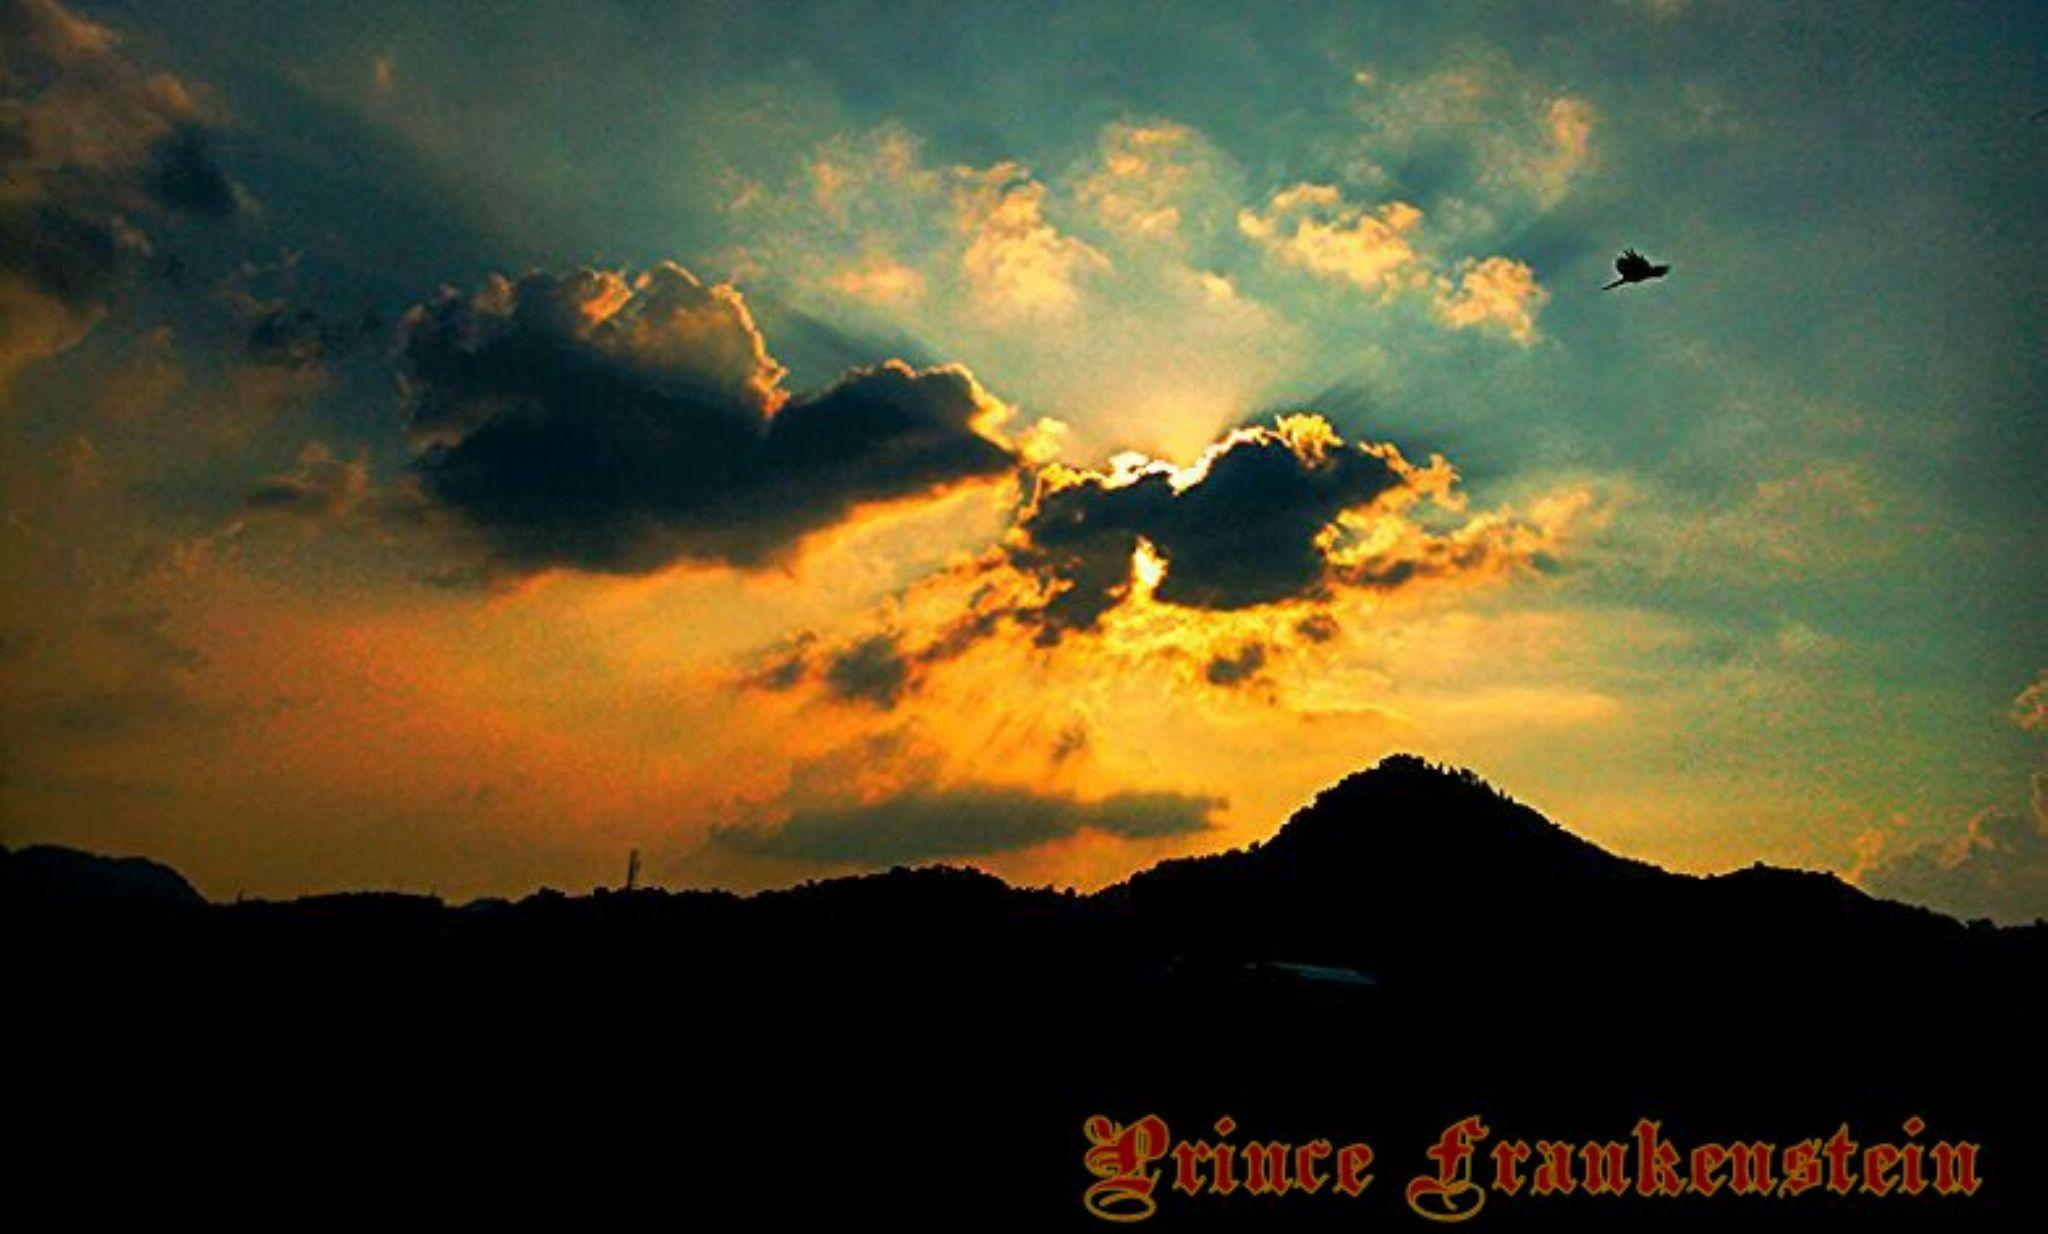 Mystical Dusk by jiban.dreamer